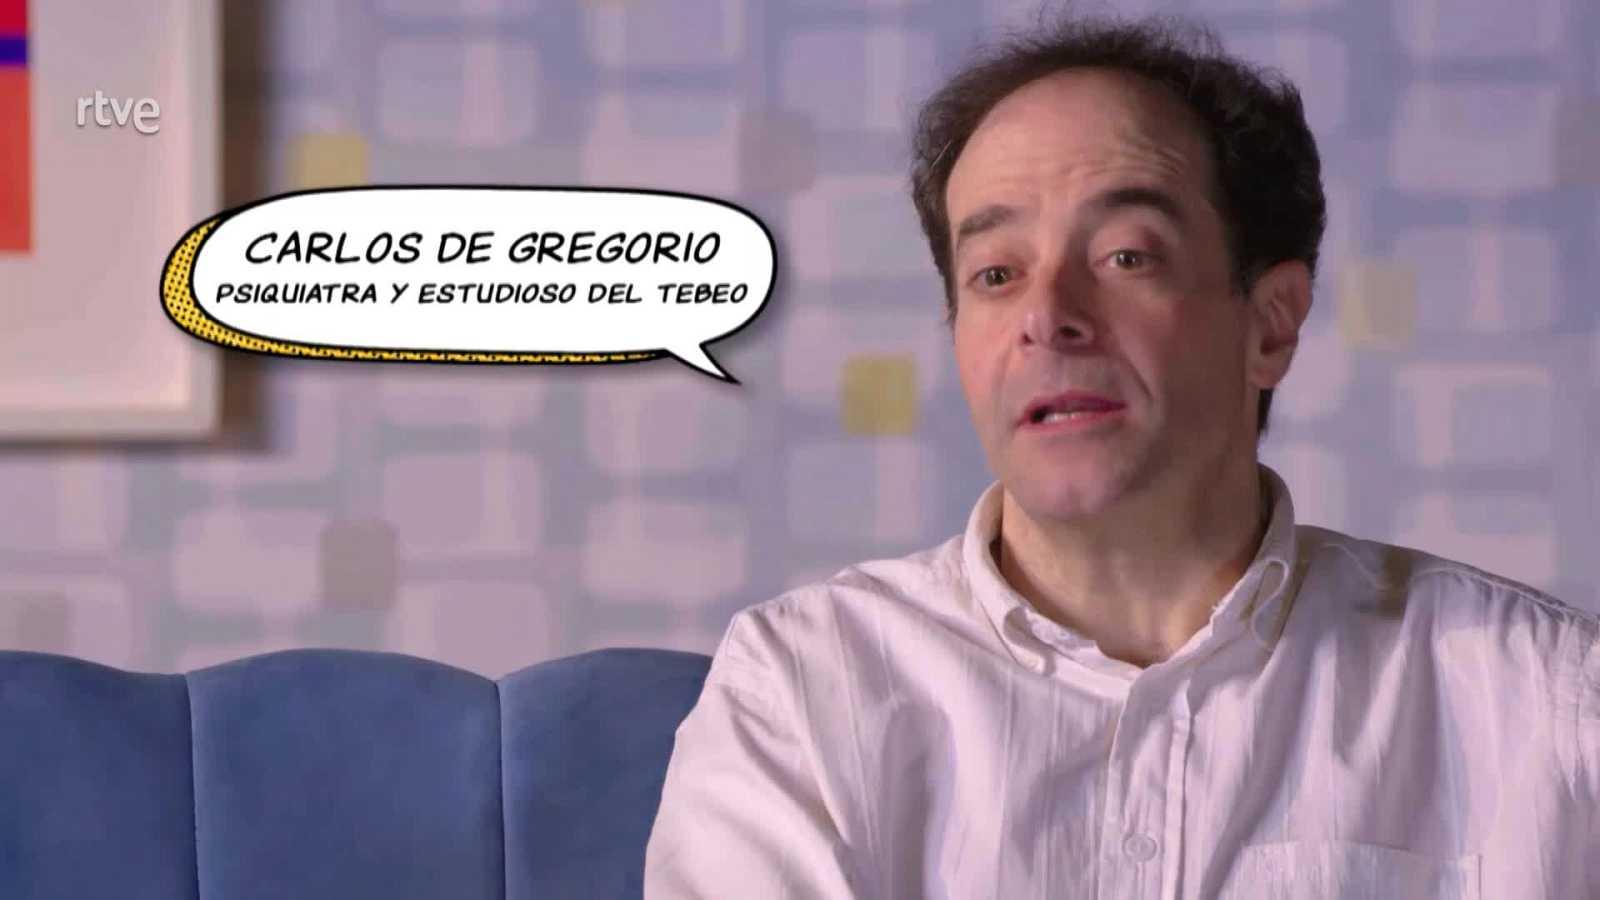 Avance del documental  'Ibáñez', que podréis ver en 'Imprescindibles' este domingo, 20 de diciembre